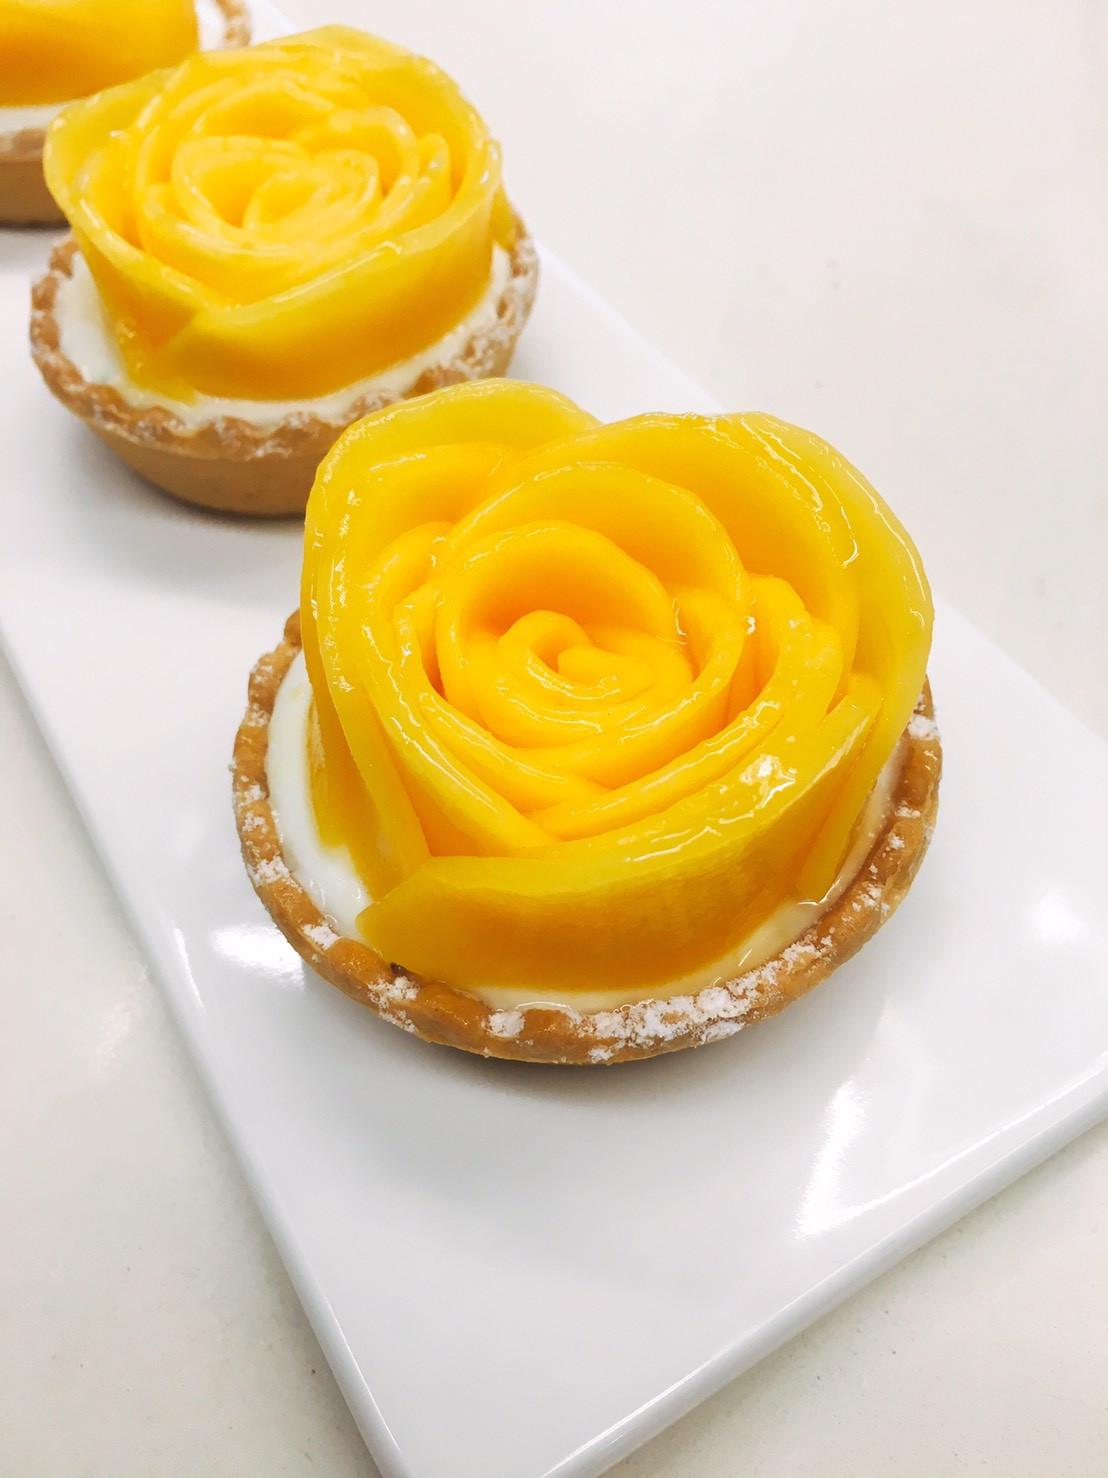 【Tomiz小食堂】芒果乳酪塔